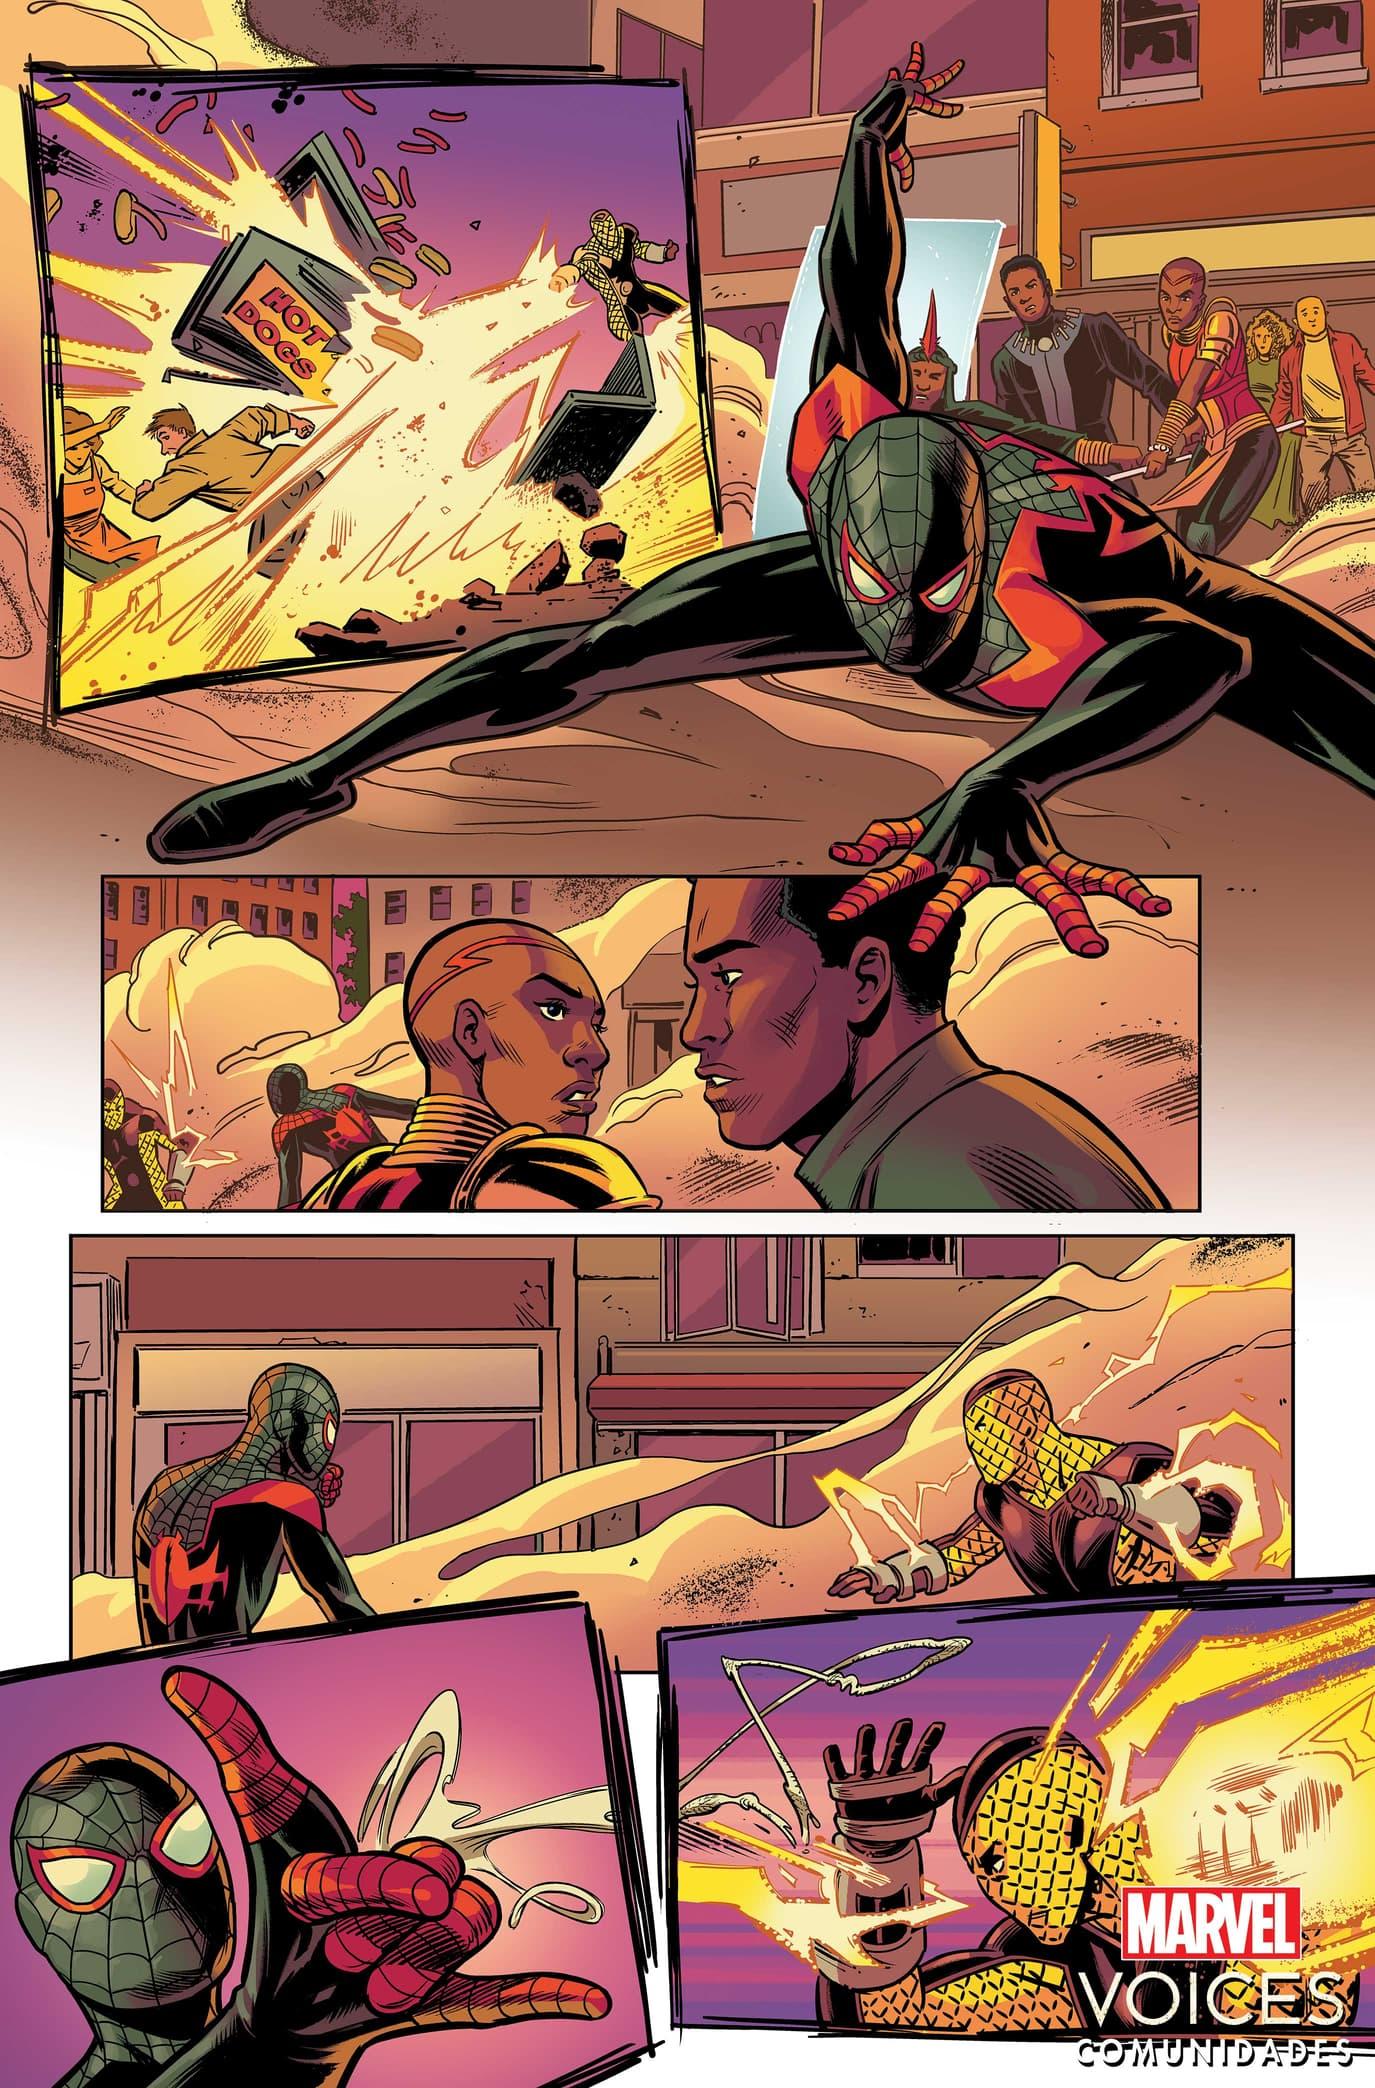 Marvel's Voices: Comunidades #1 Interior Art